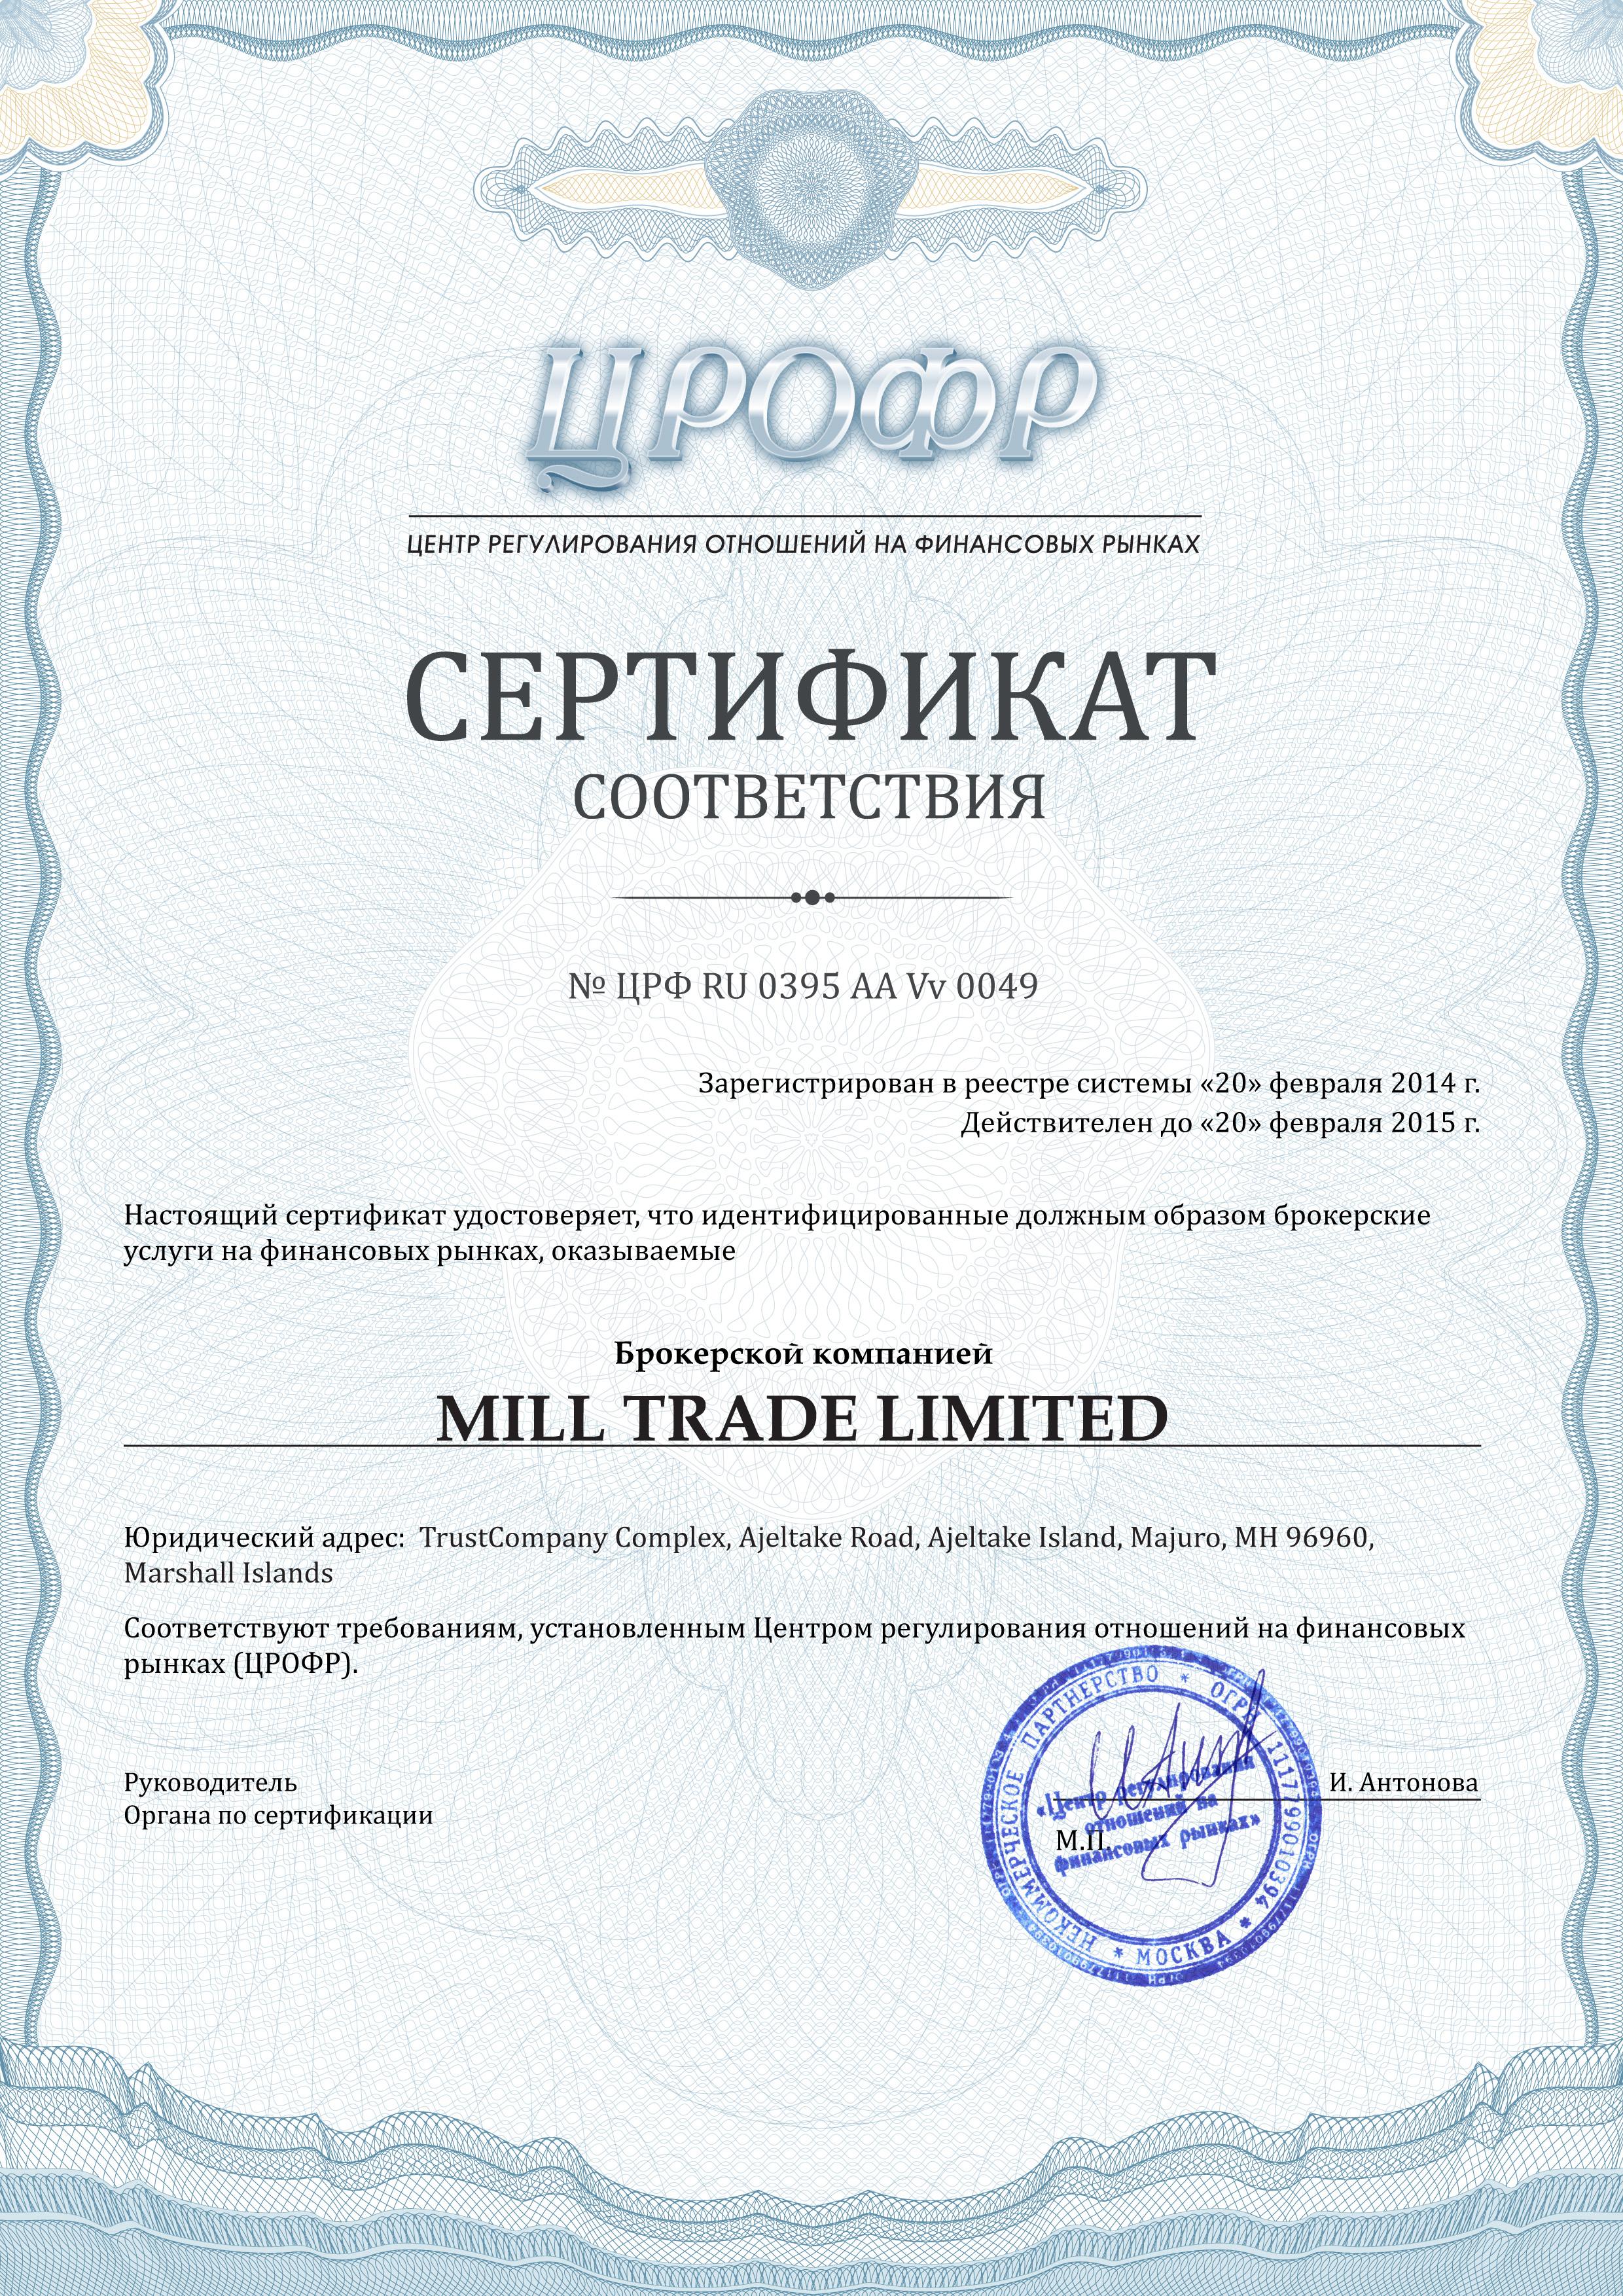 Сертификат ЦРОФР компании MillTrade